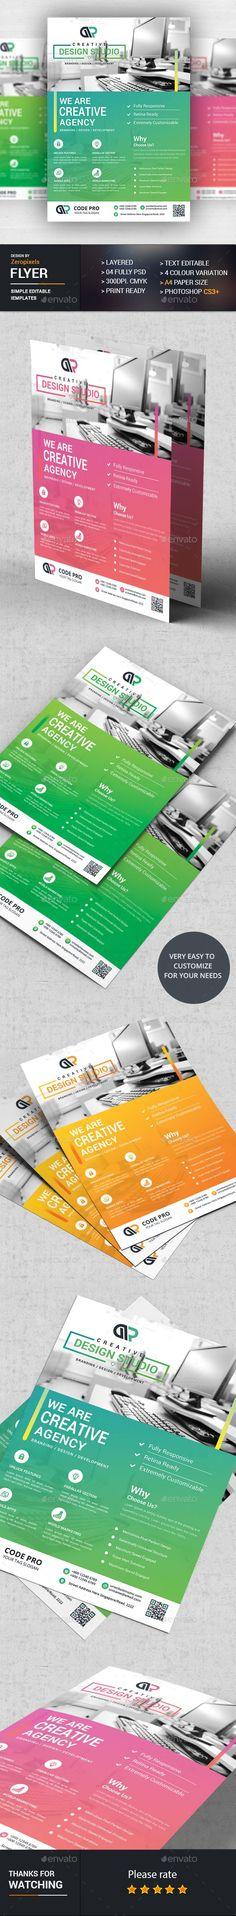 Corporate Flyer  Web Design Agency  Web Design Agency Design